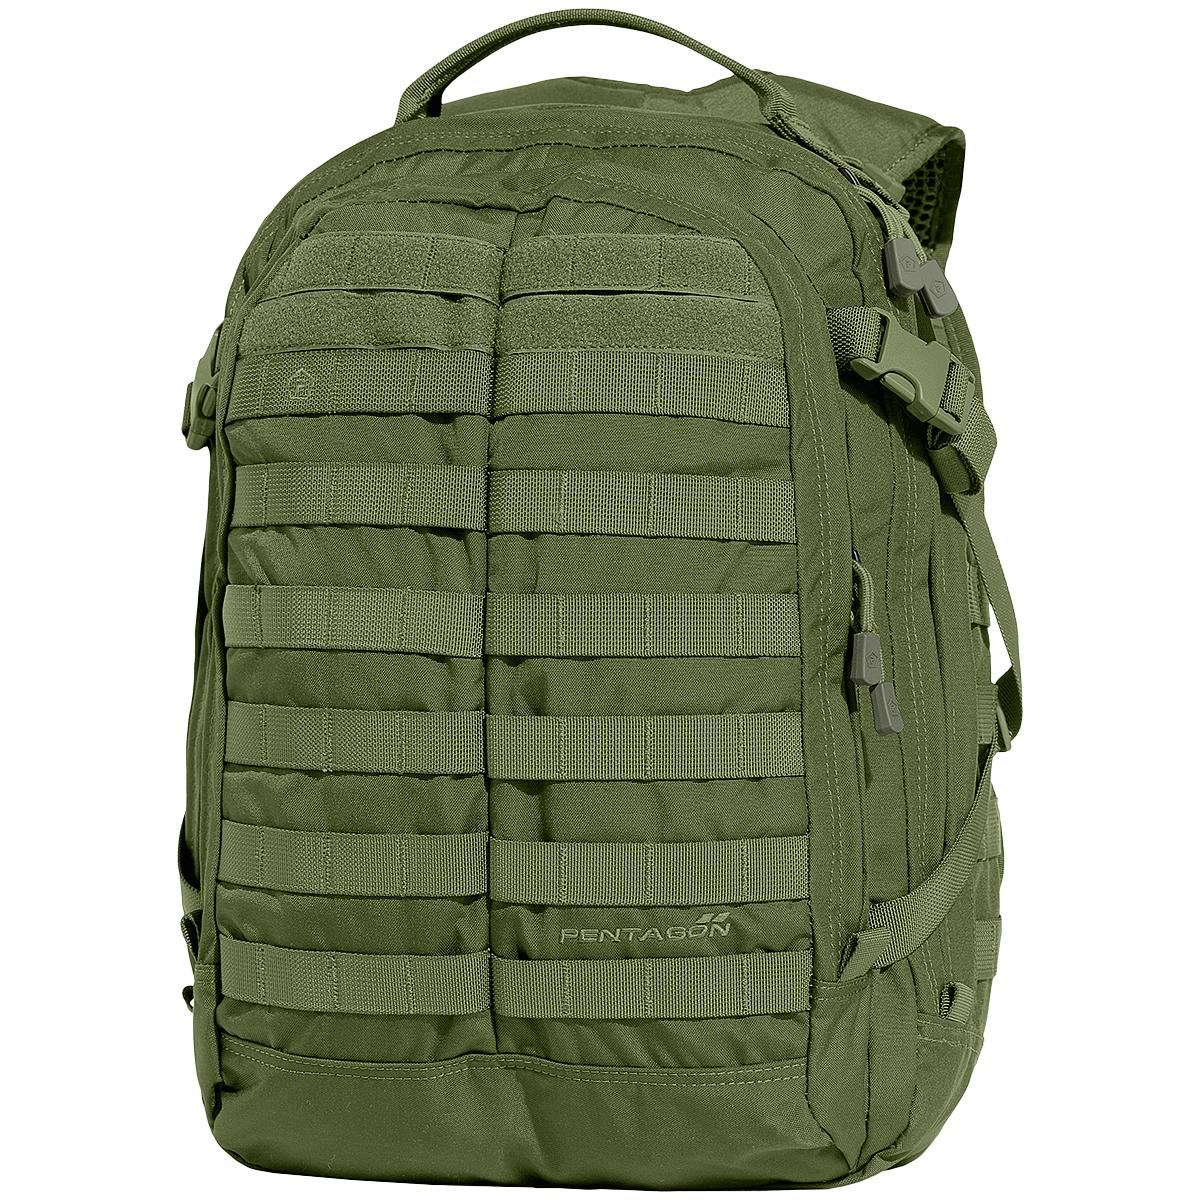 Pentagon Kyler Backpack Tactical Military Army Molle Pals Rucksack Kendal Tote Green Sentinel Bag Olive